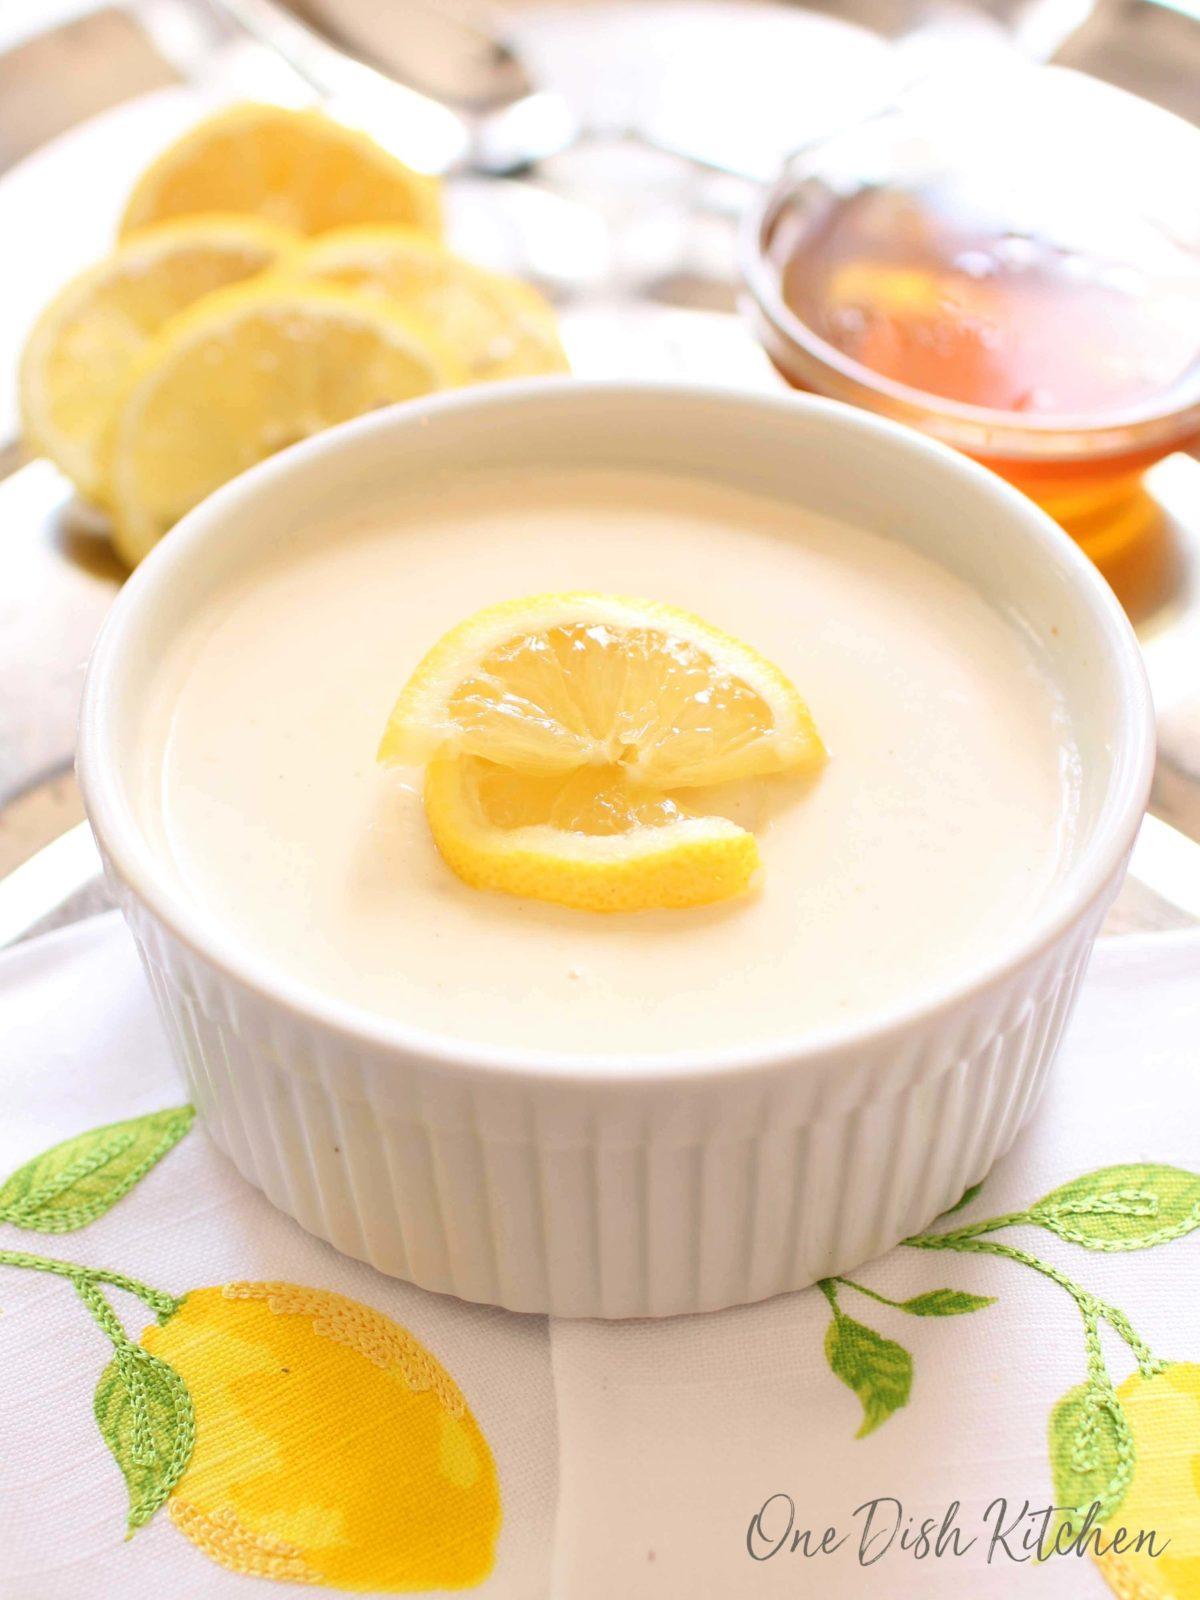 Honey lemon custard in a ramekin next to sliced lemons and a small bowl of honey all on a metal tray